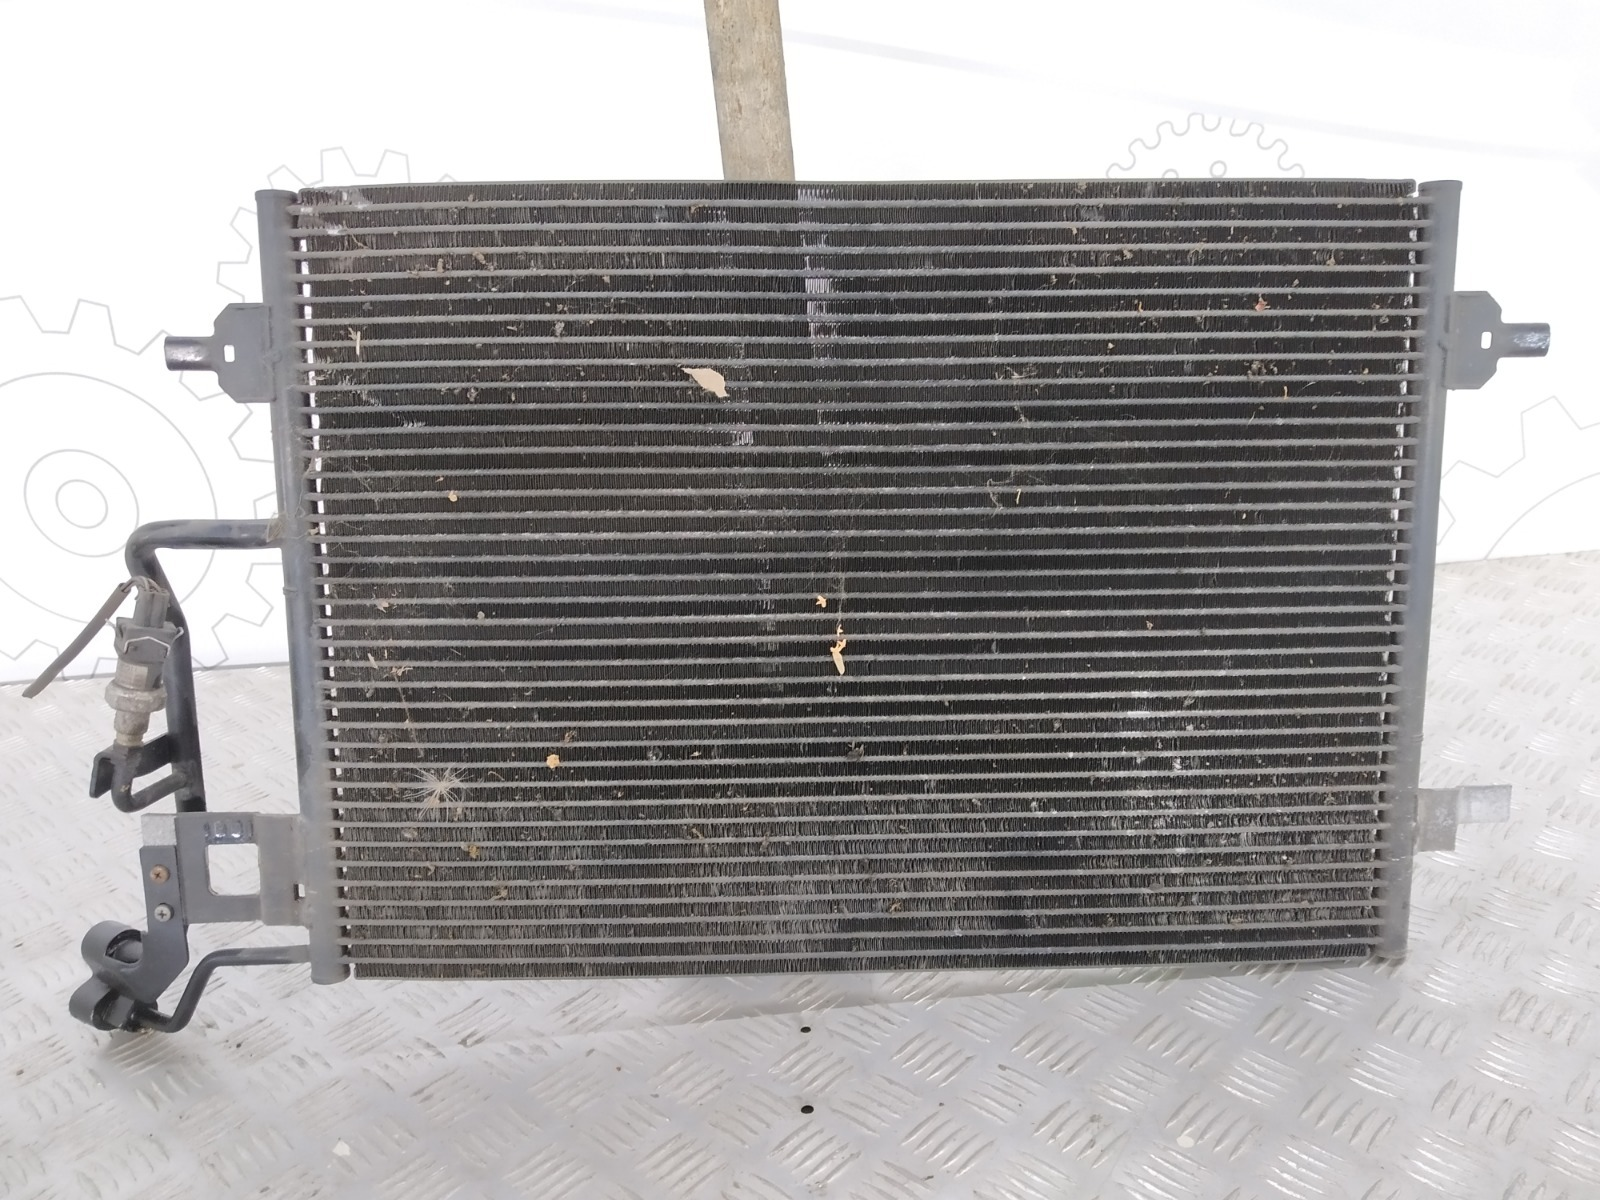 Радиатор кондиционера Volkswagen Passat B5 1.9 TDI 2002 (б/у)